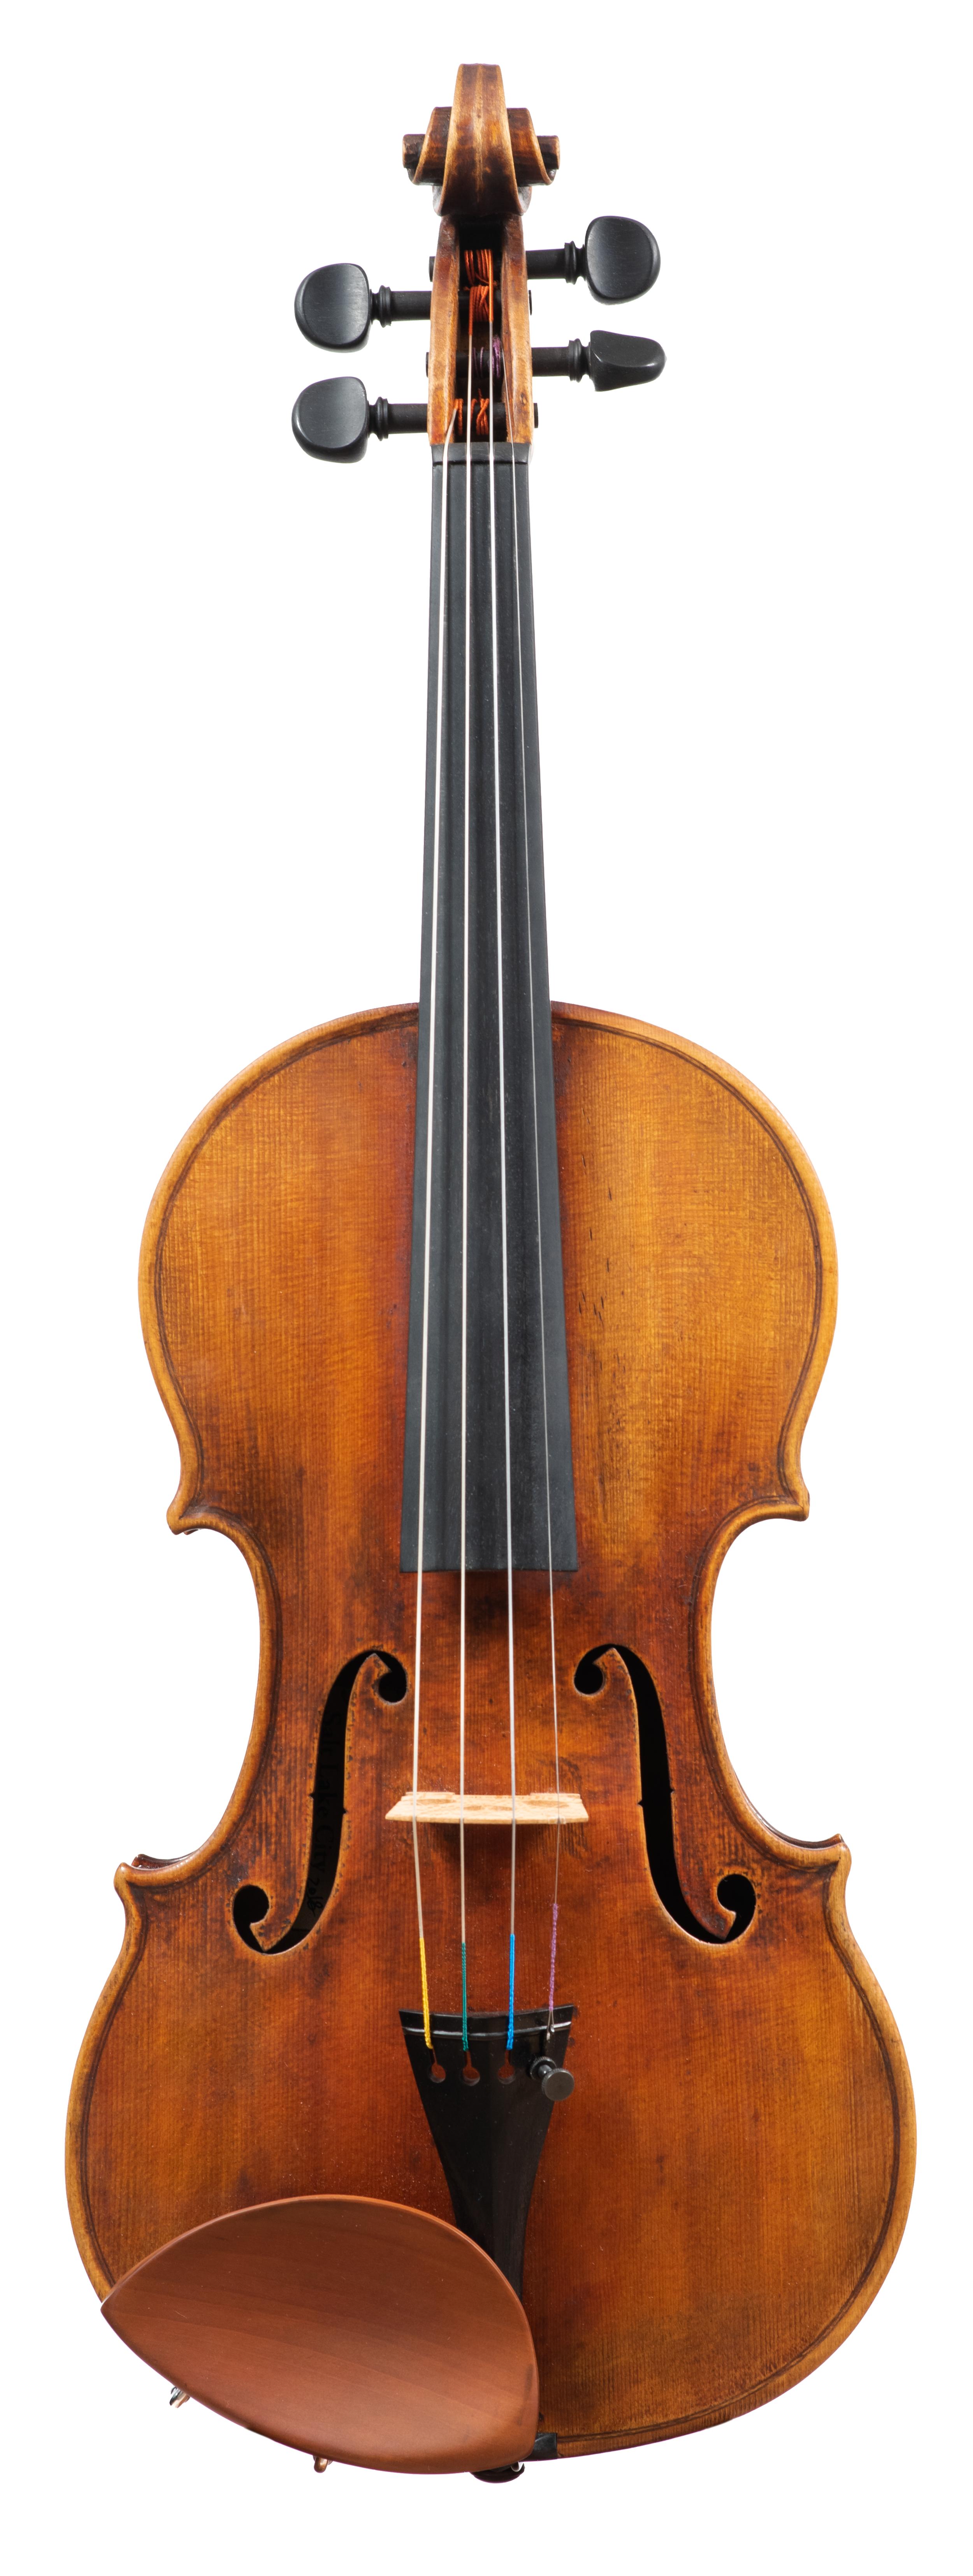 Jordan Hess Violin, 2018, Salt Lake City, UT_Front (1).jpg